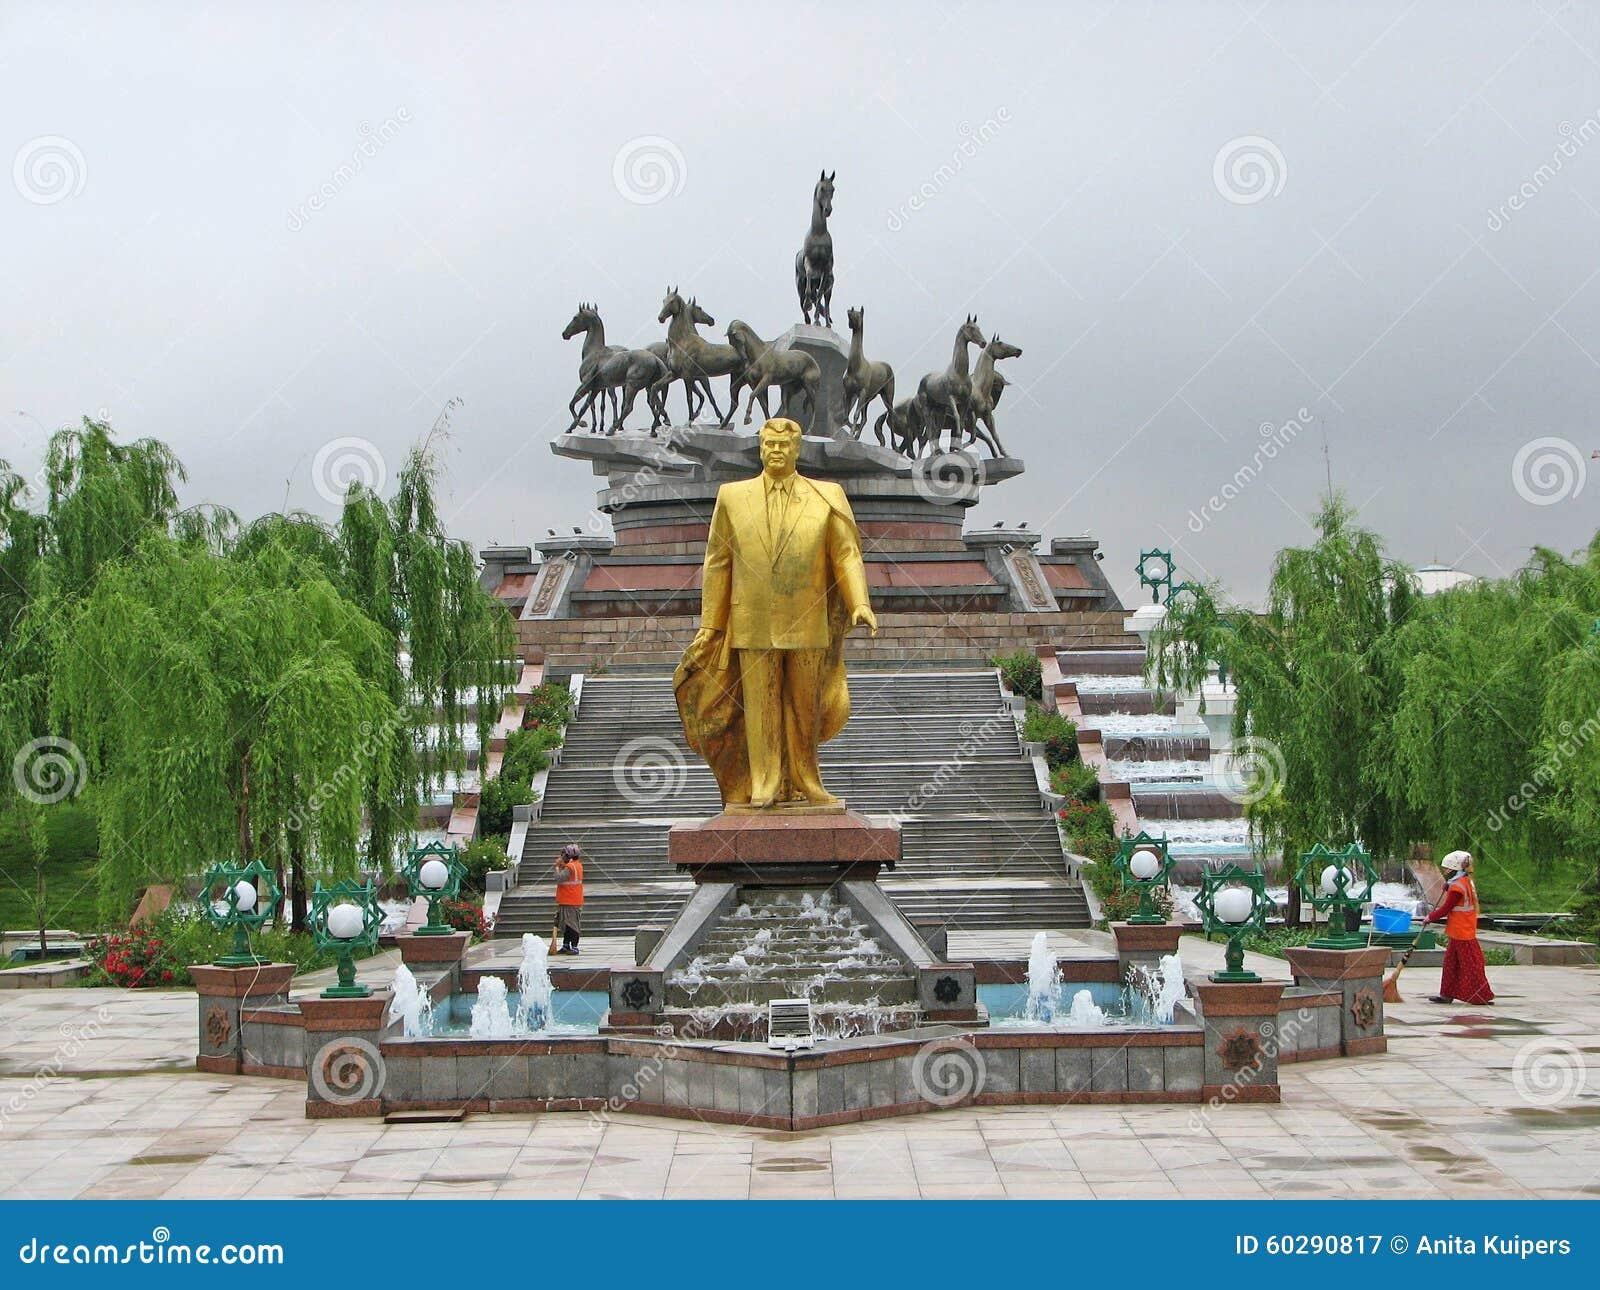 Image result for saparmurat niyazov statue